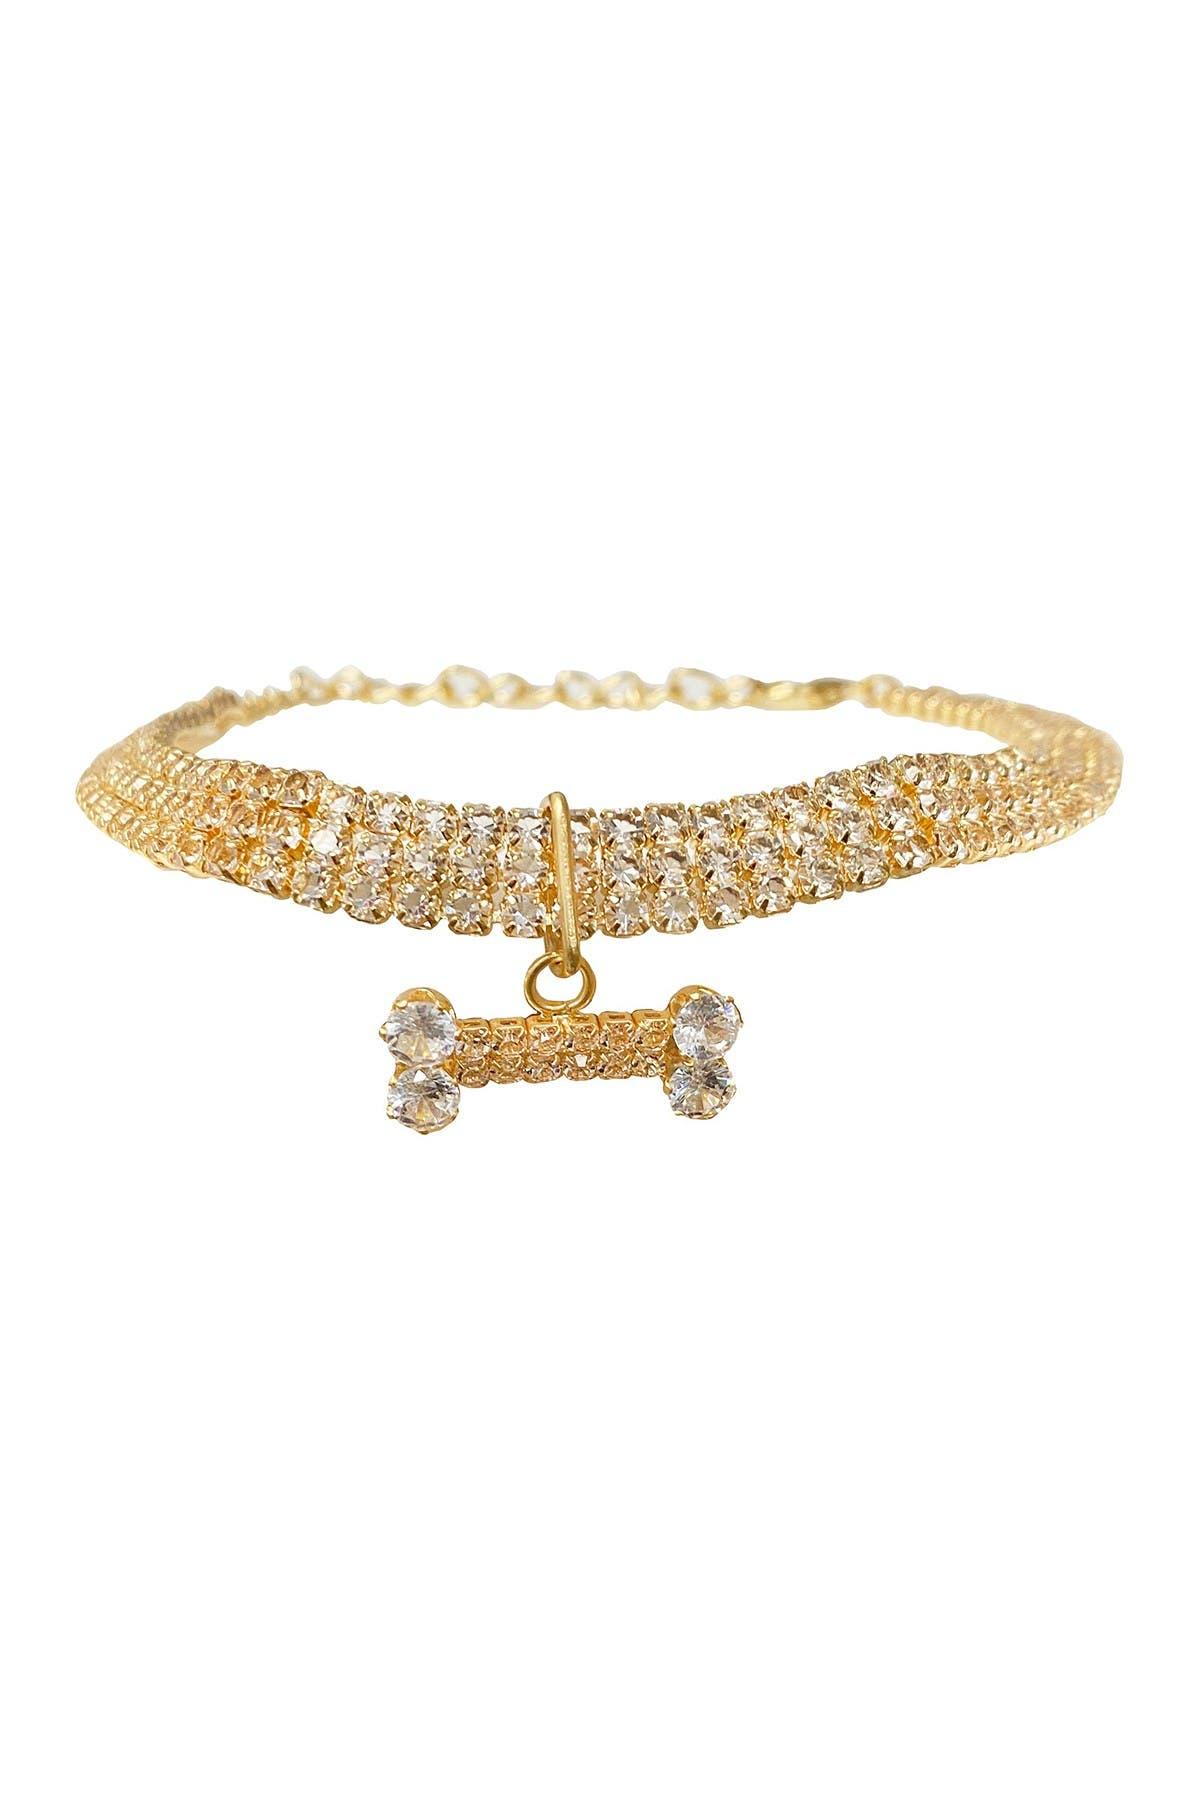 Image of Dogs of Glamour Carti Luxury Bone Pendant Gold - Medium